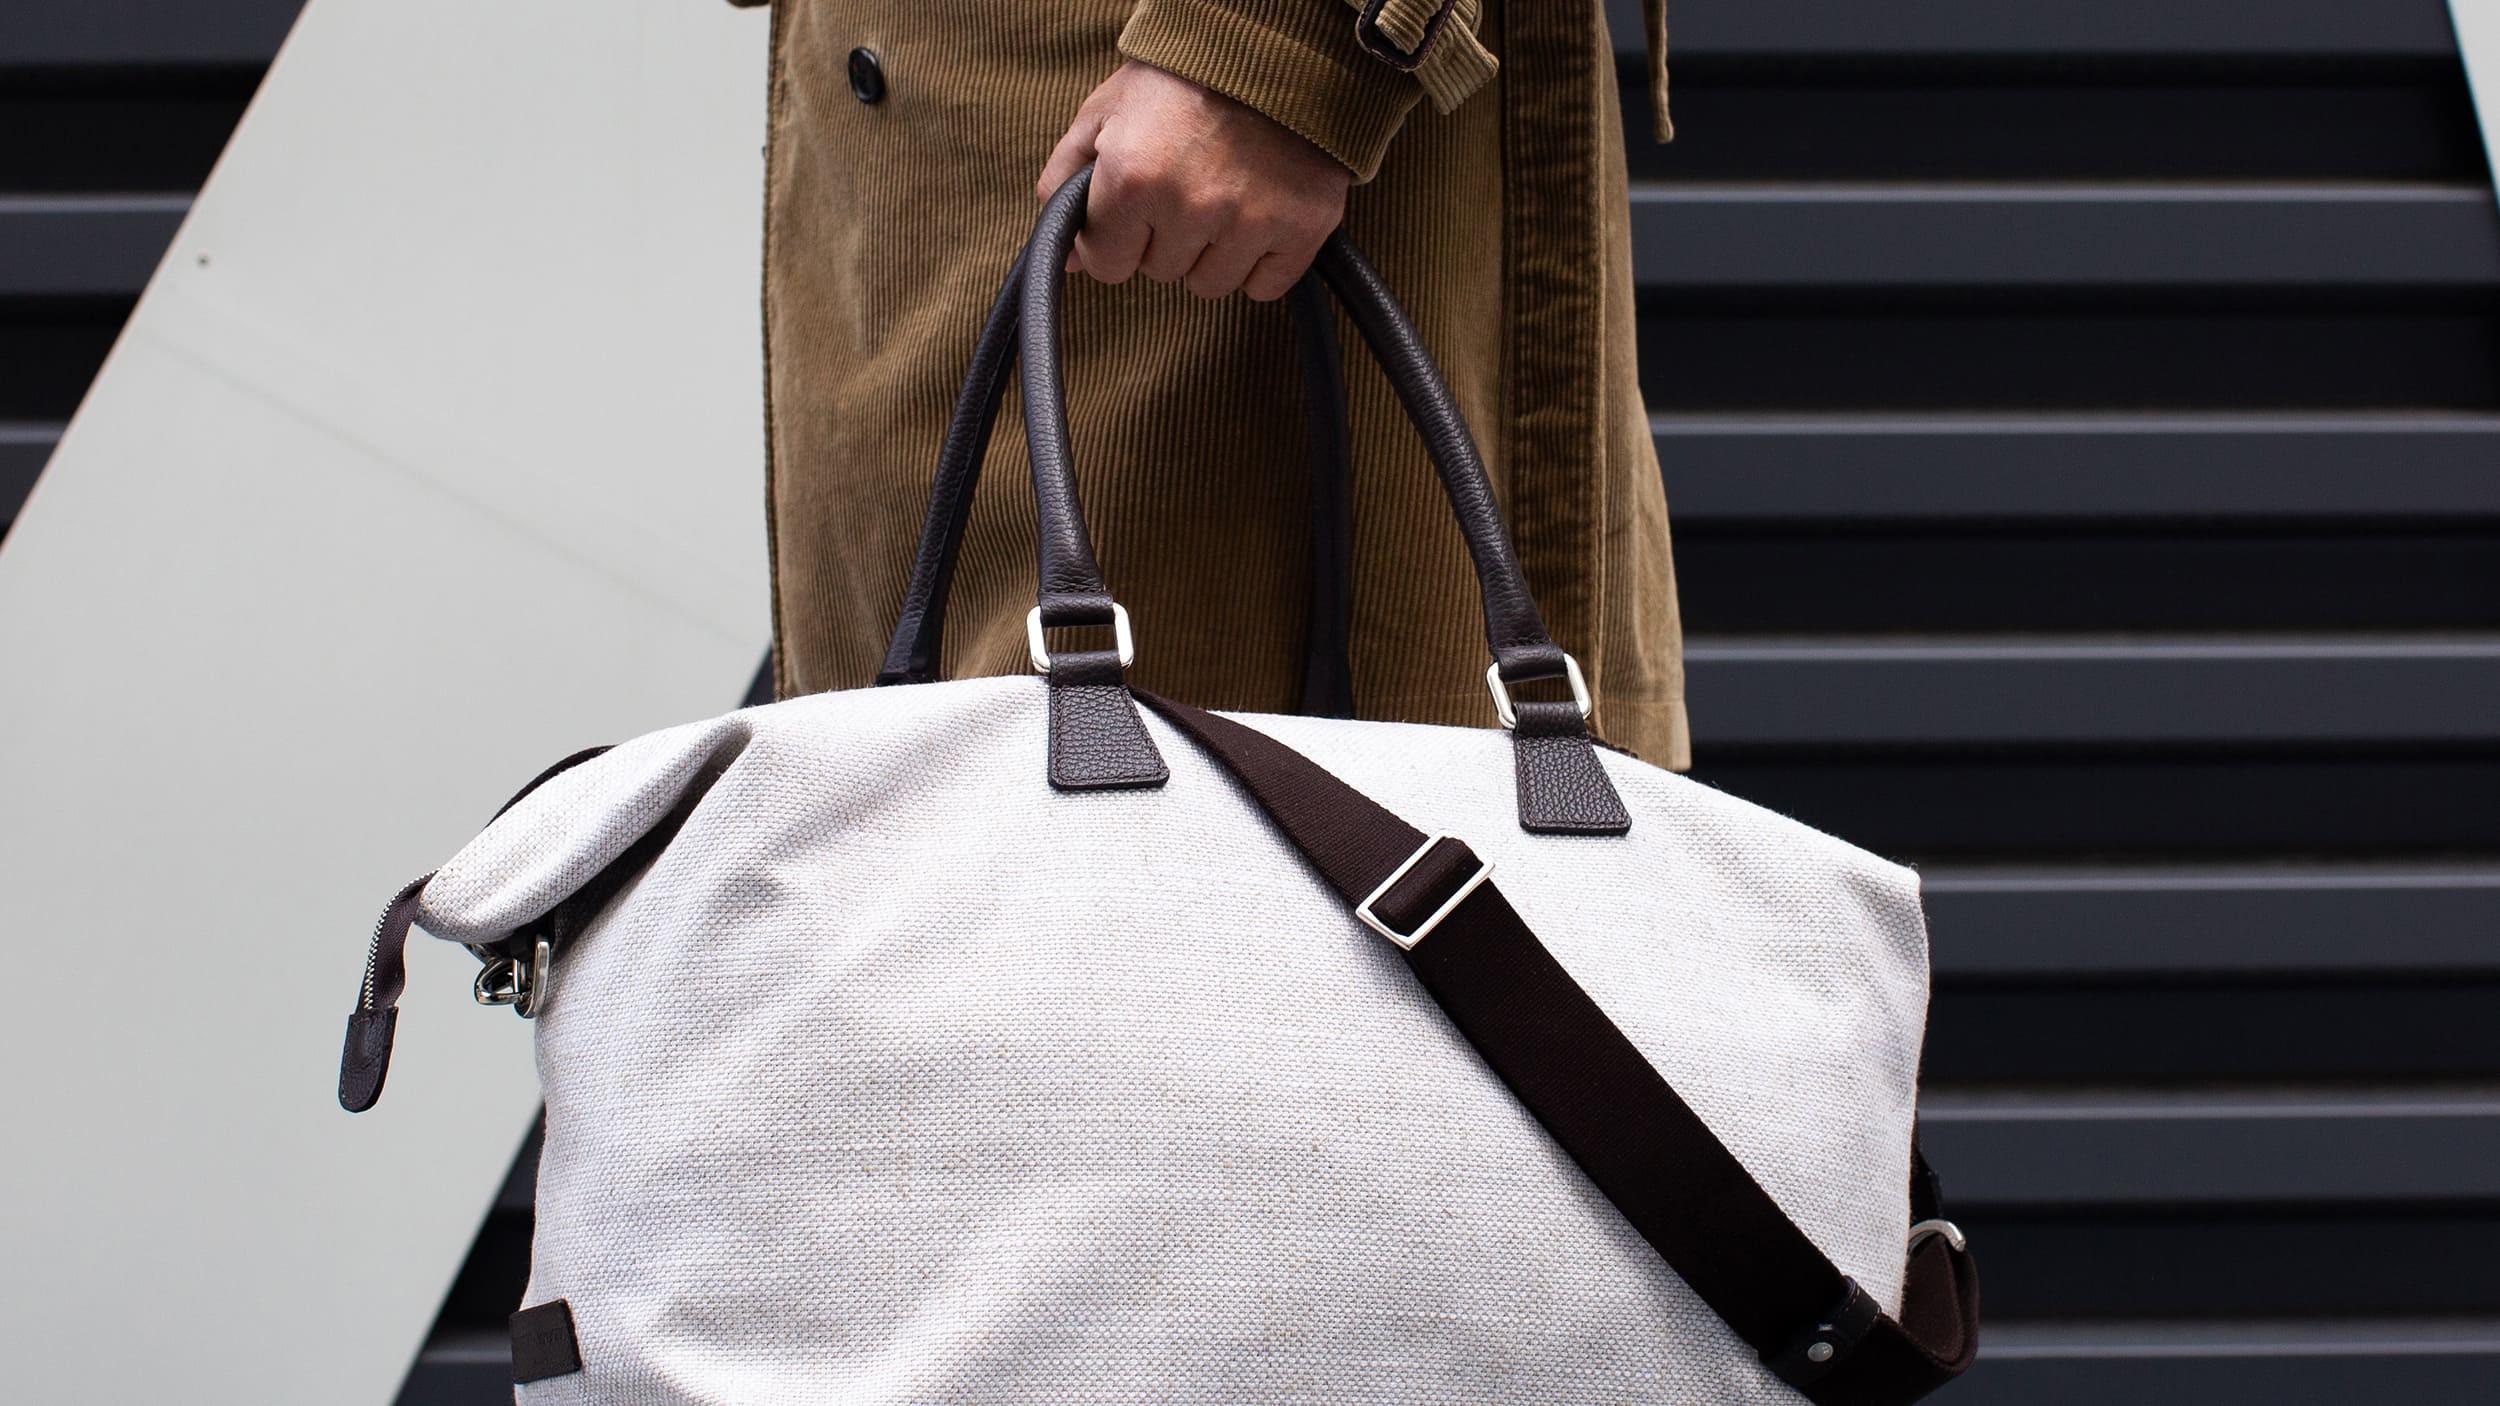 Borsone da viaggio in lino | Weekender Bag linen | Borsa Weekend